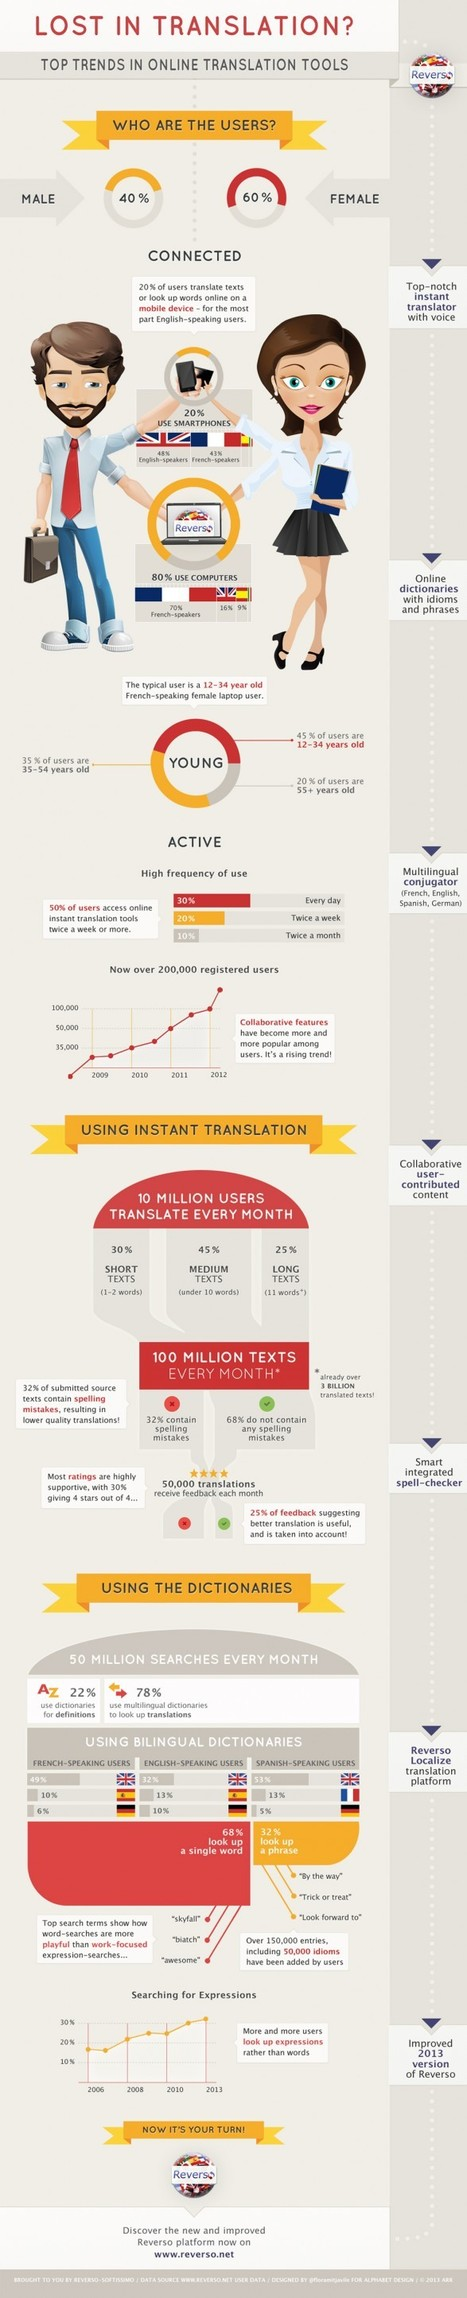 Top Trends in Online Translation Tools [INFOGRAPHIC]   Dana Translation   Scoop.it